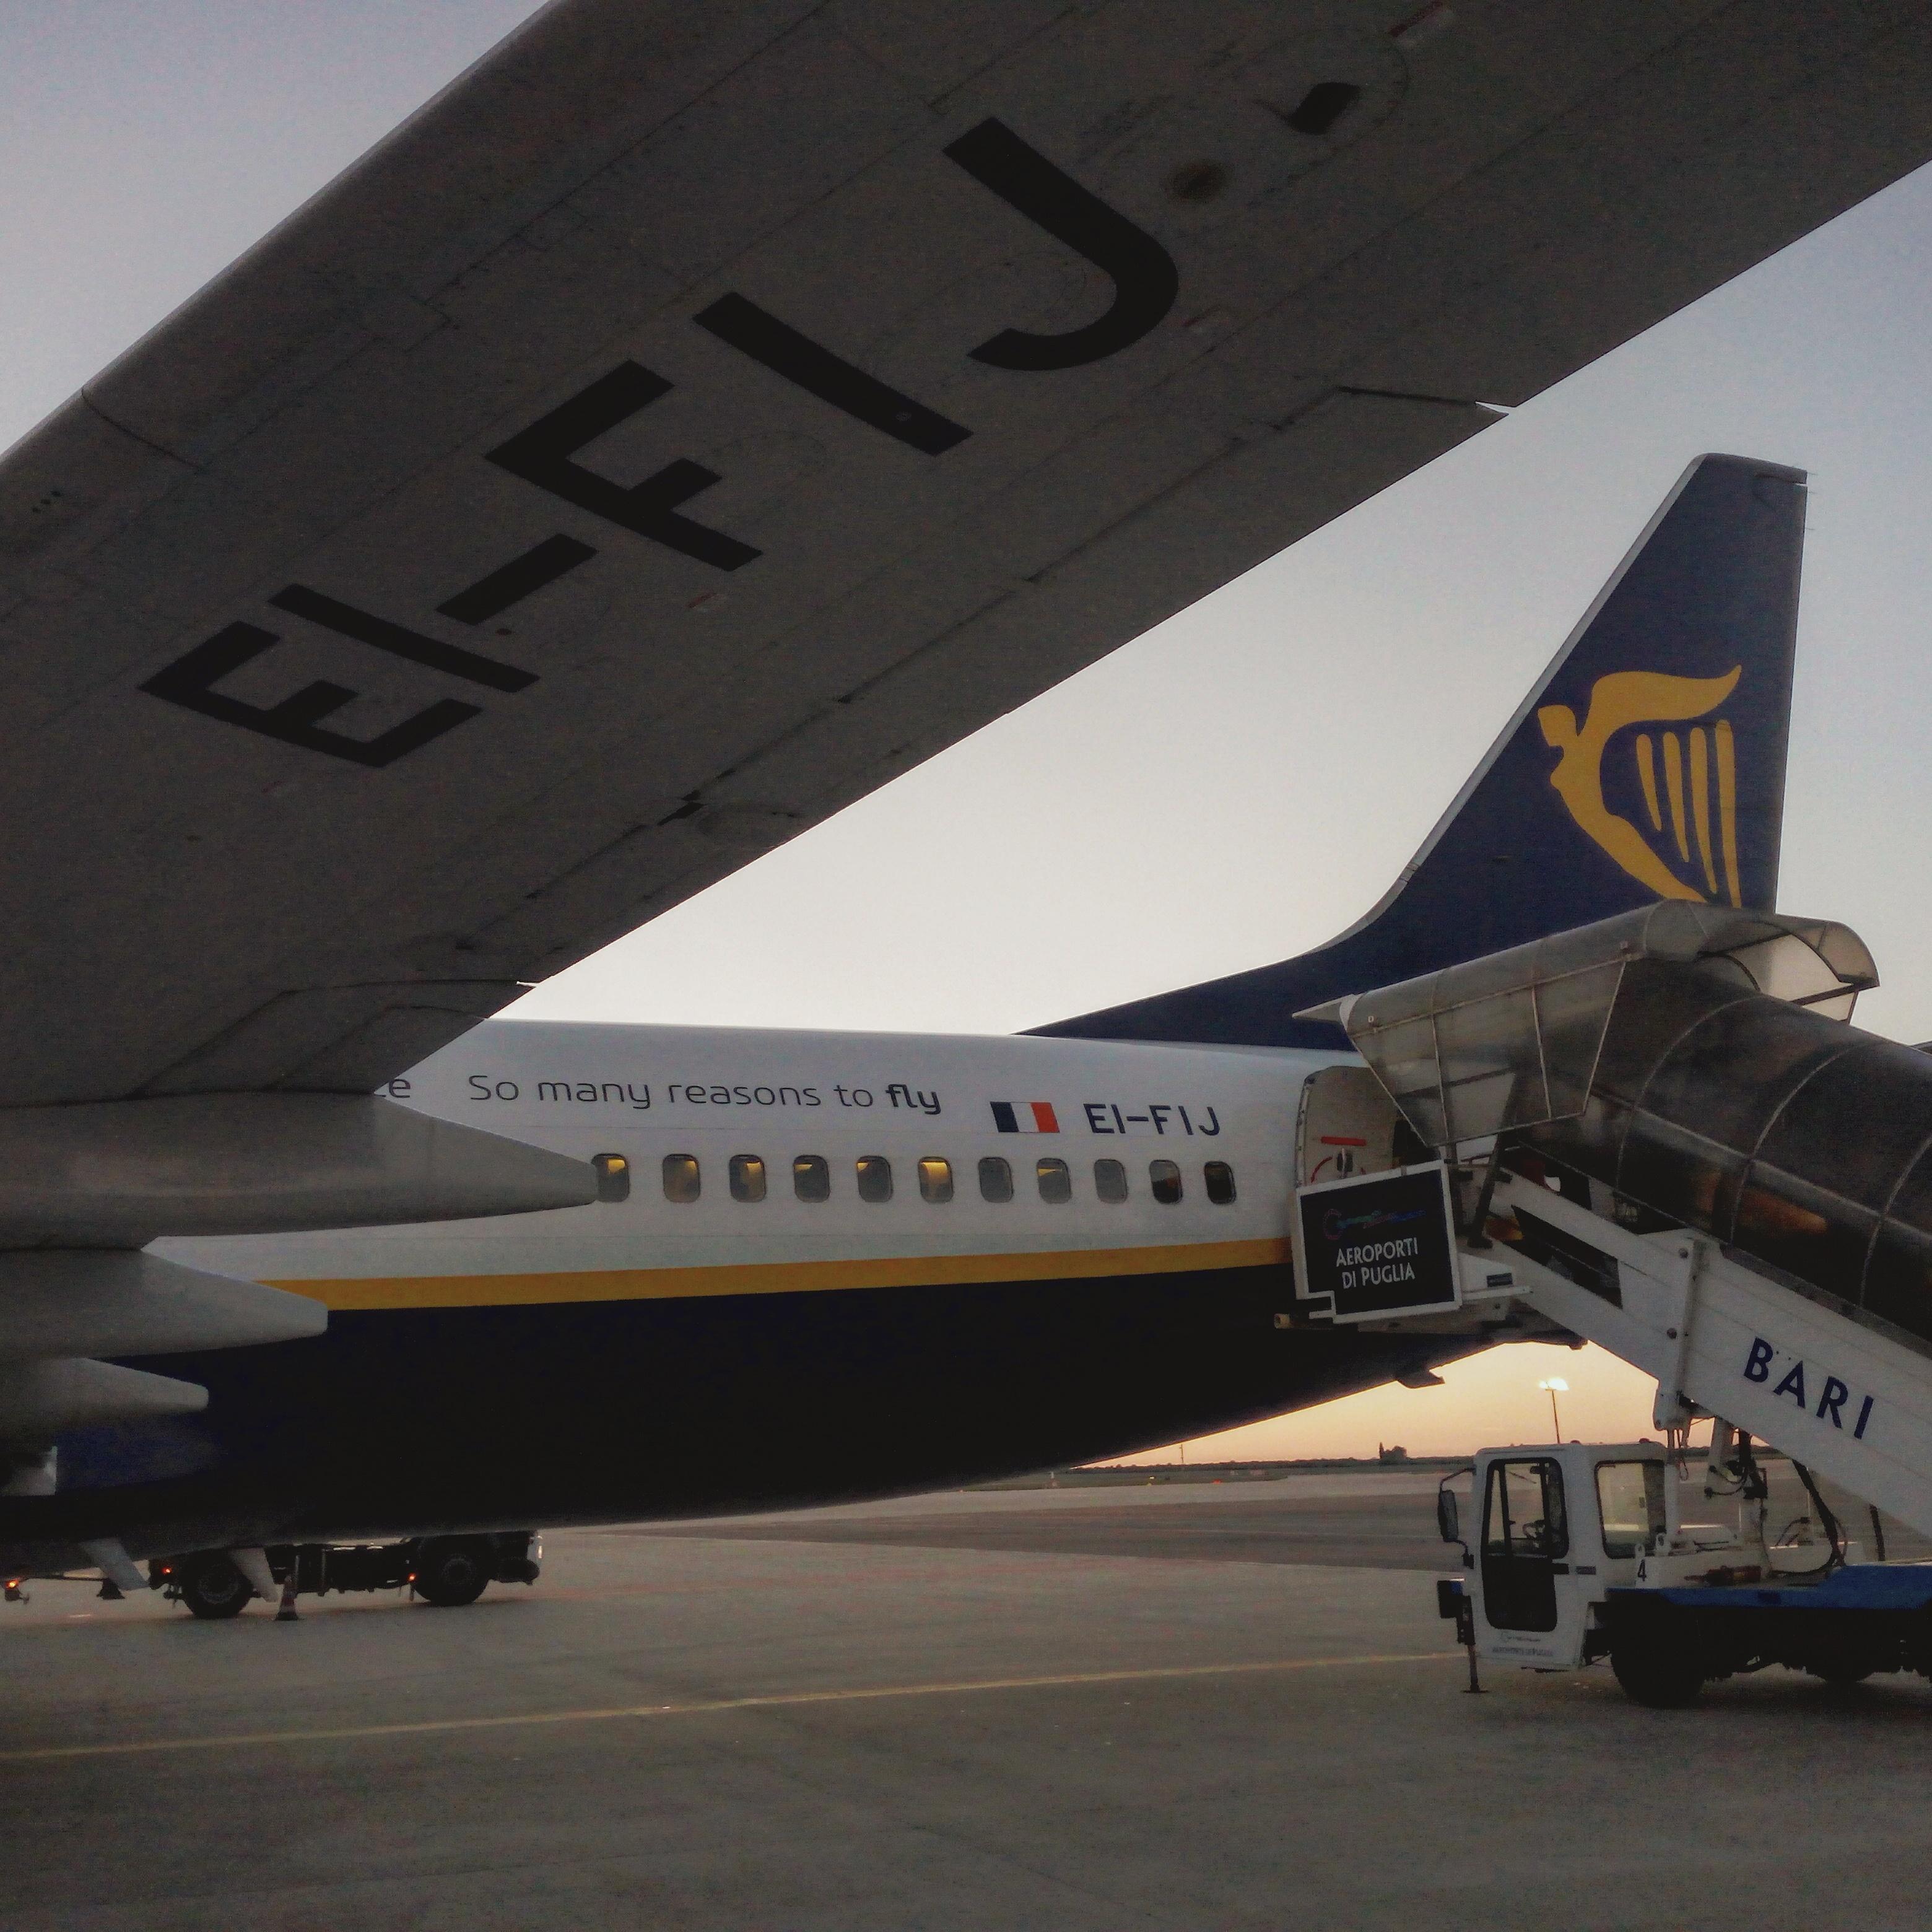 organizzare viaggi low cost - Ryanair